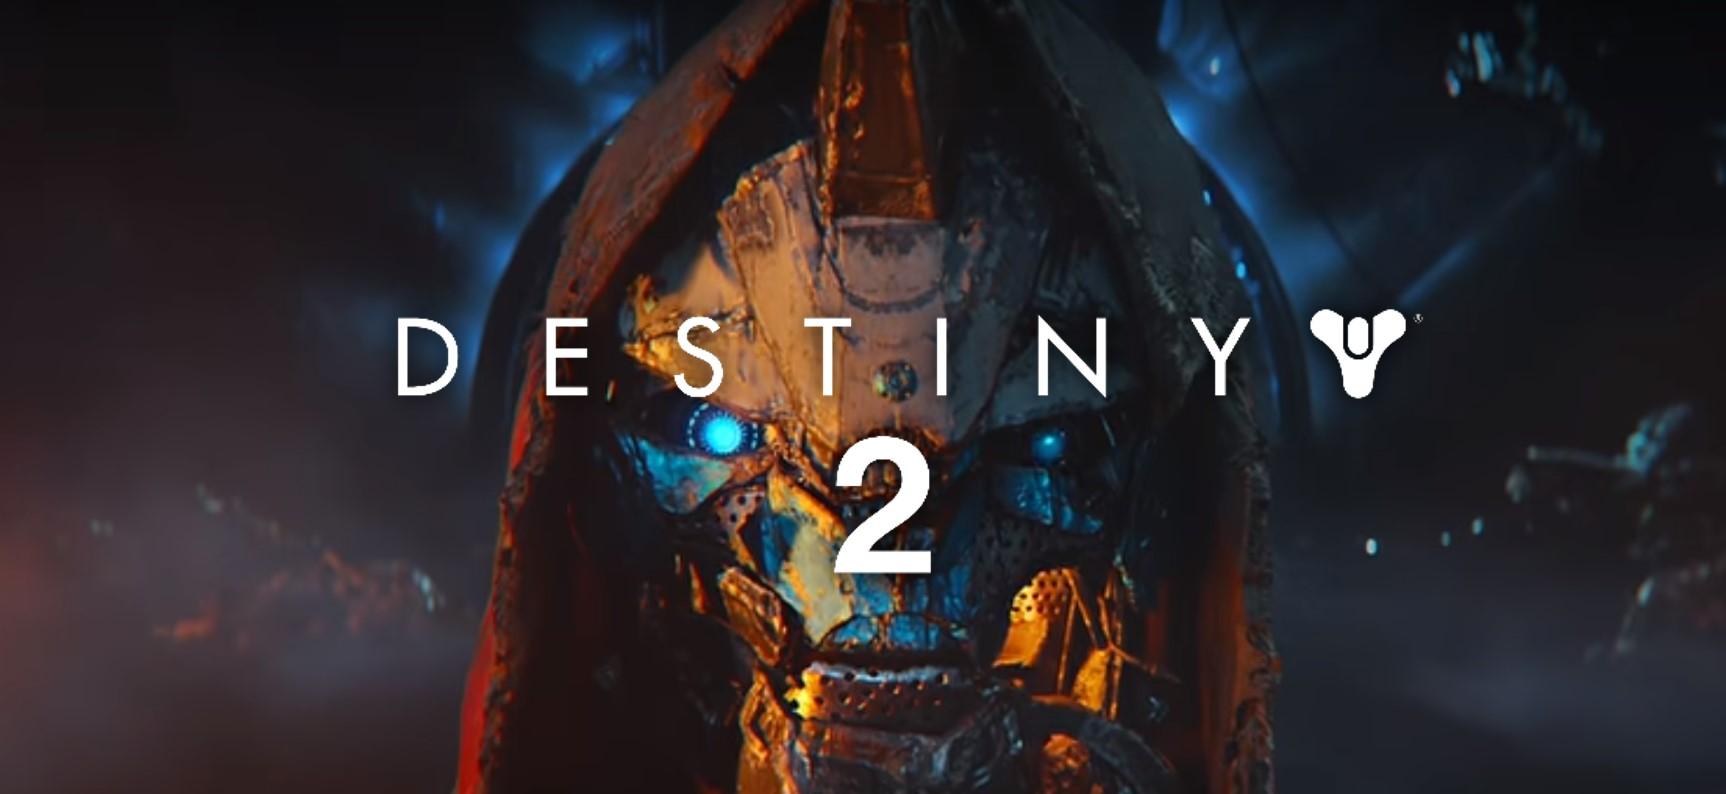 destiny-cayde-titel